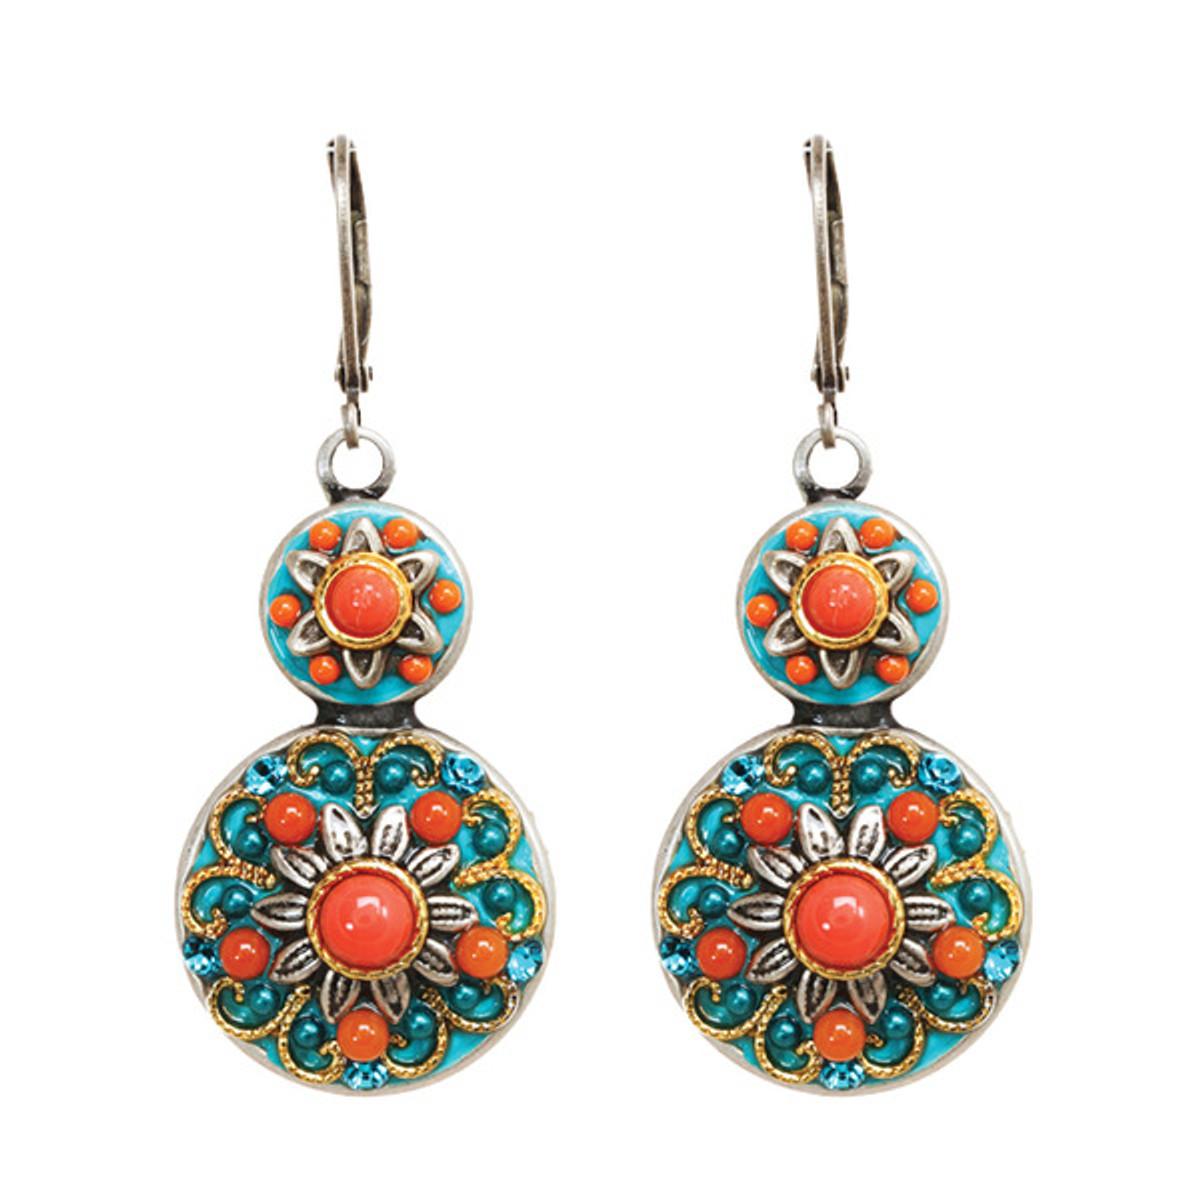 Michal Golan Coral Sea Earrings - S7672